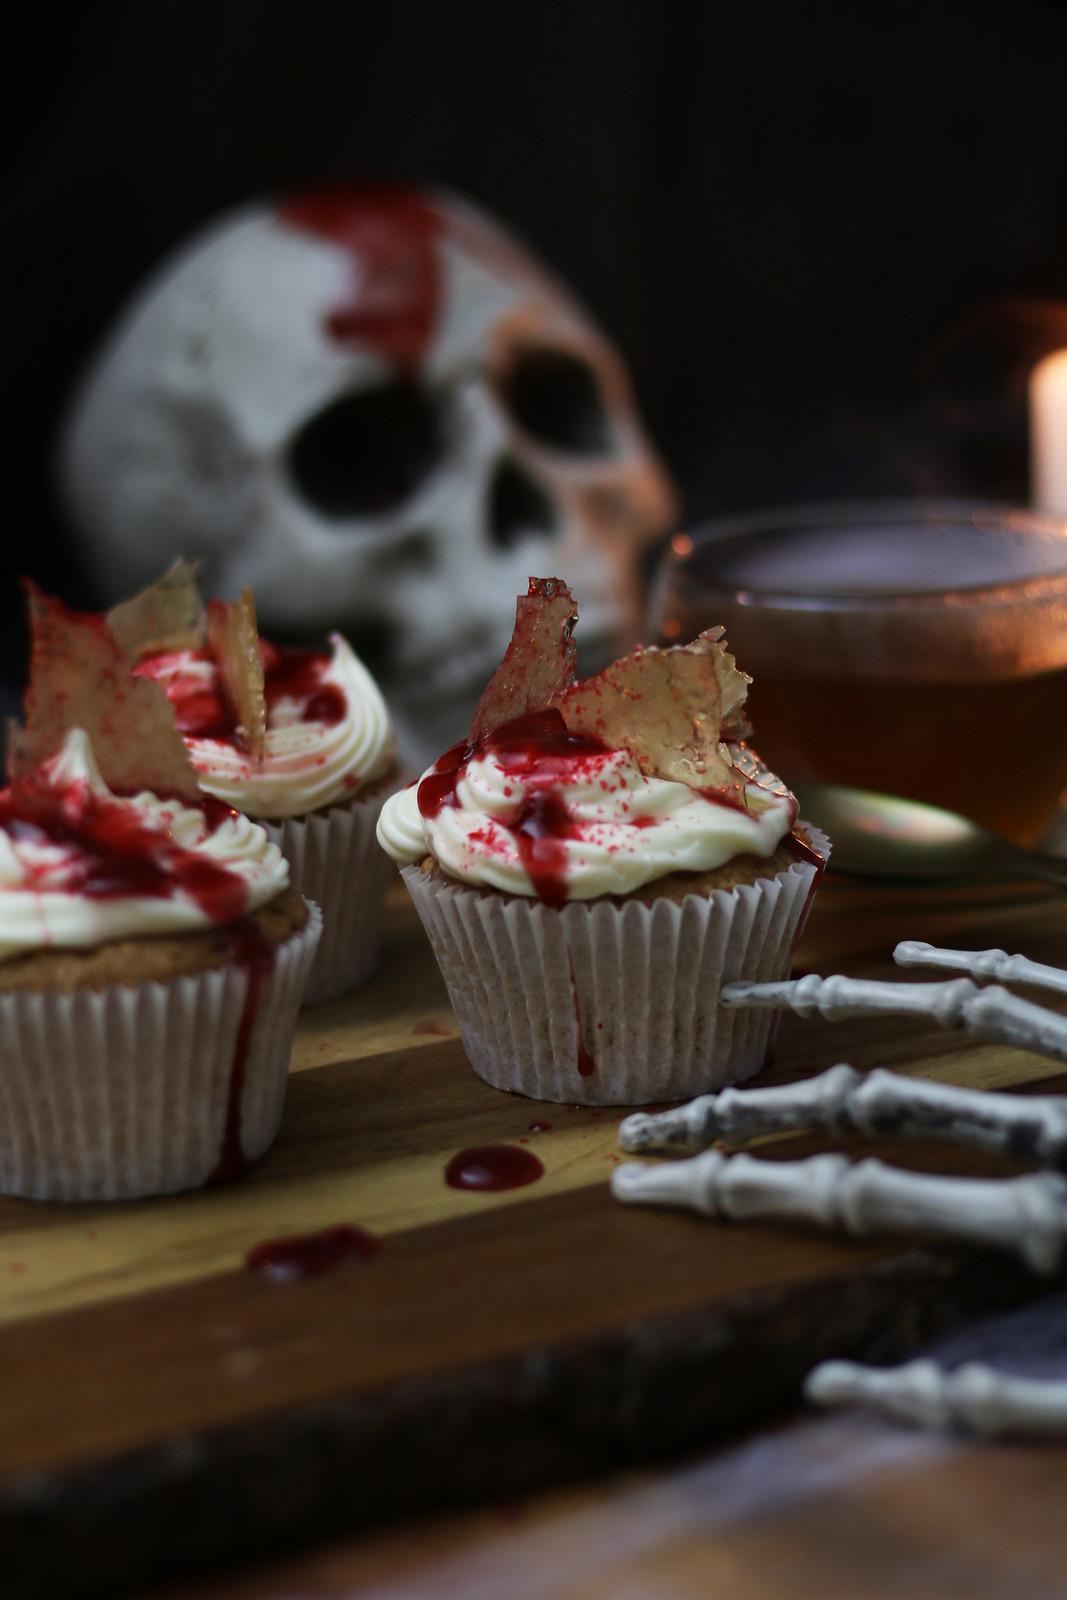 earl-grey-killer-cupcakes-by-teapro-recipe